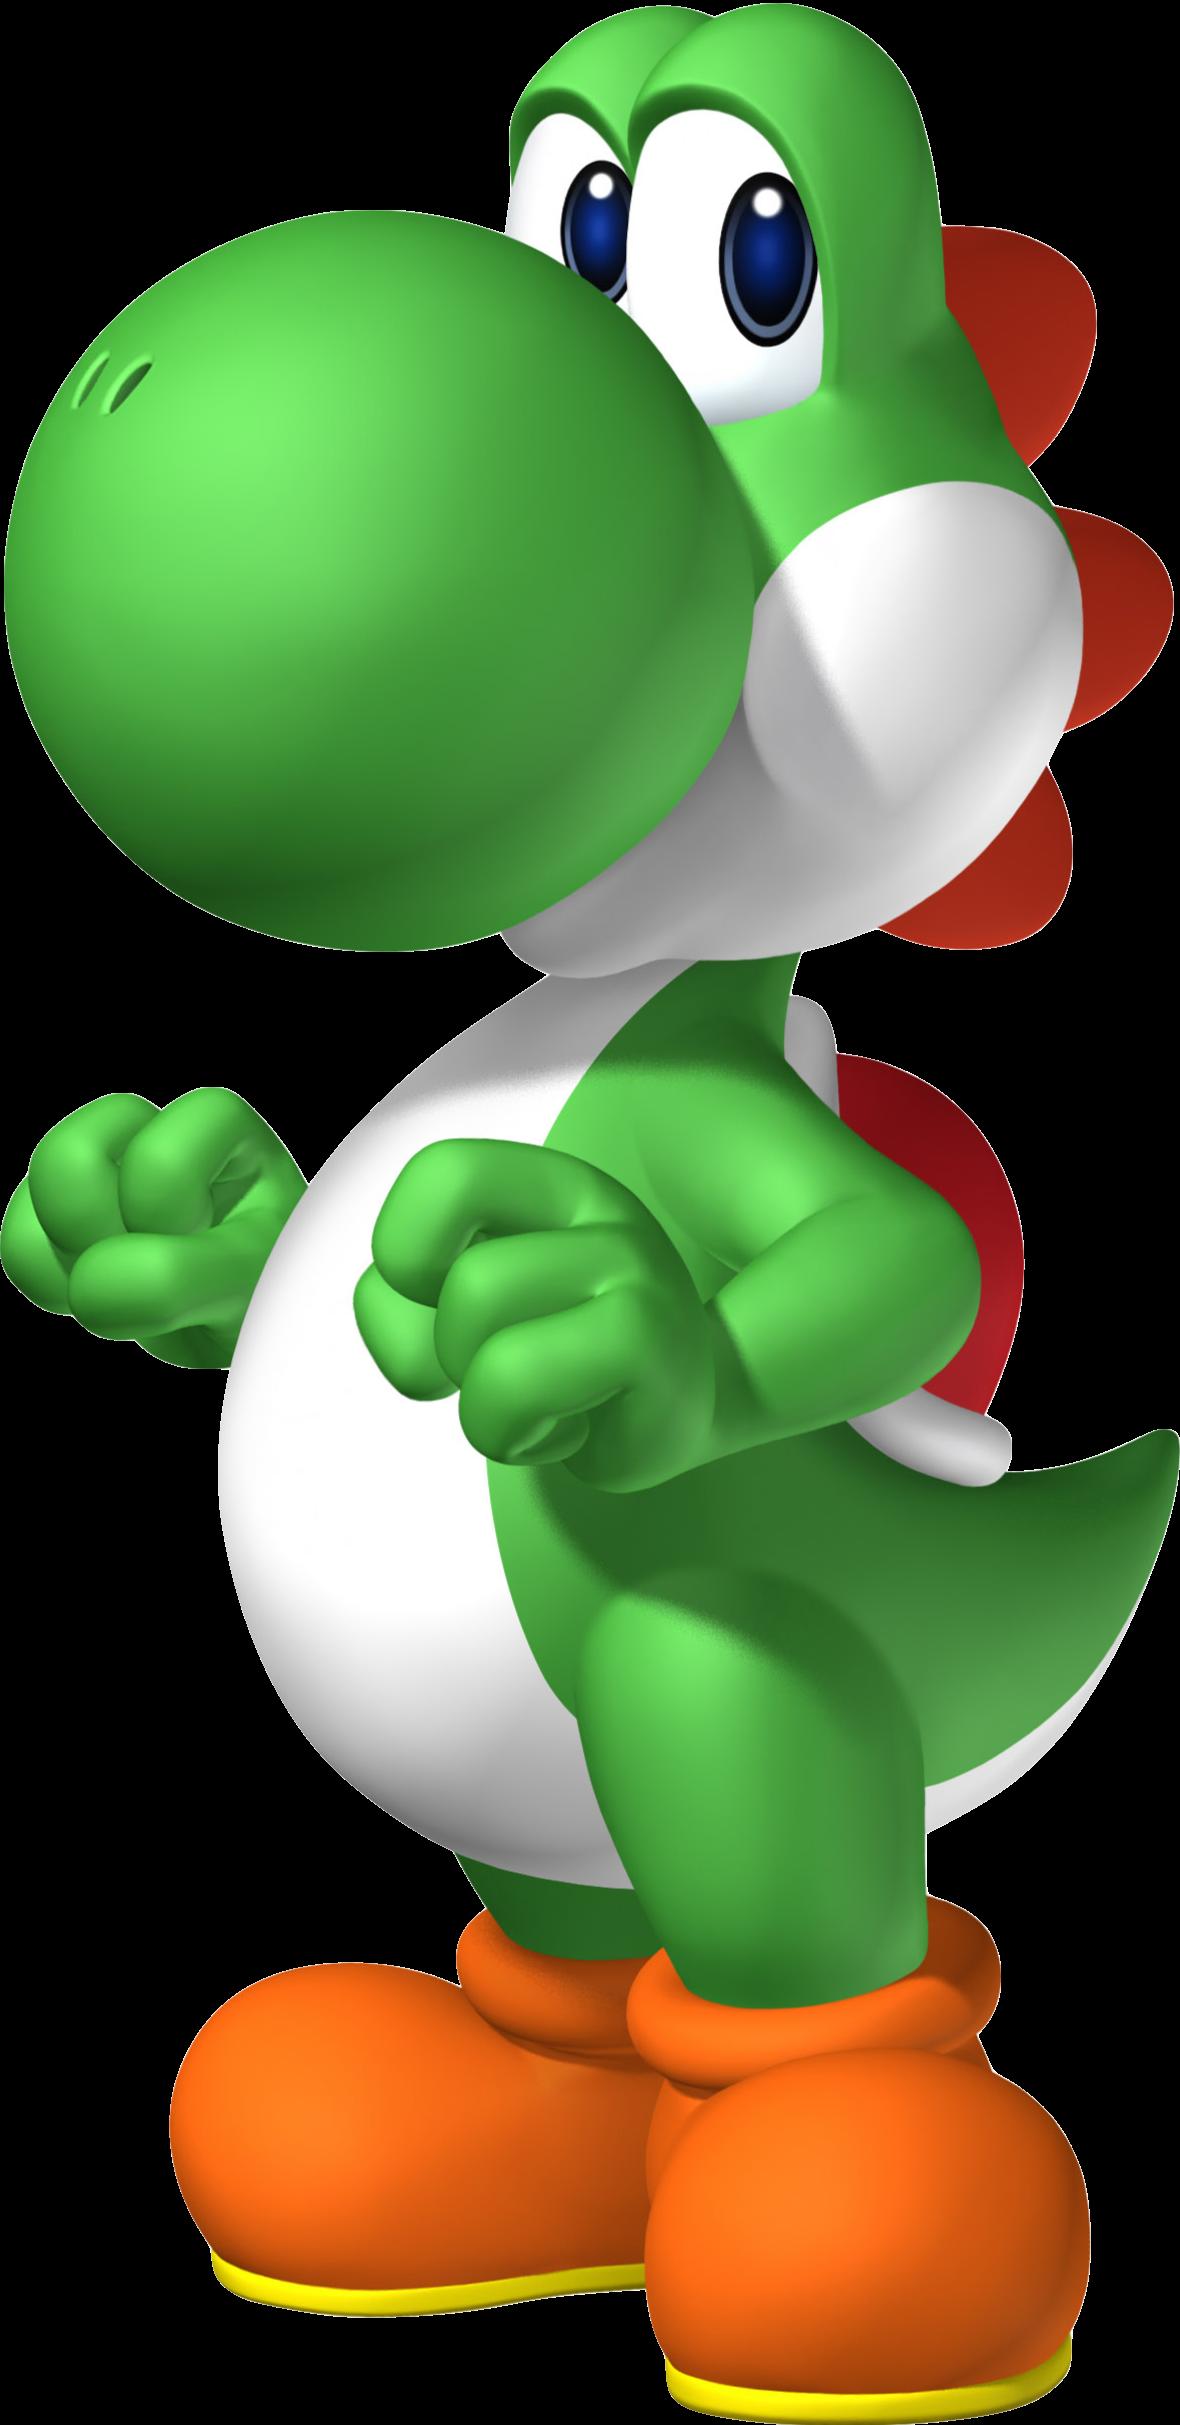 Super mario star eyes clipart jpg free library Yoshi (character) | Nintendo | FANDOM powered by Wikia jpg free library